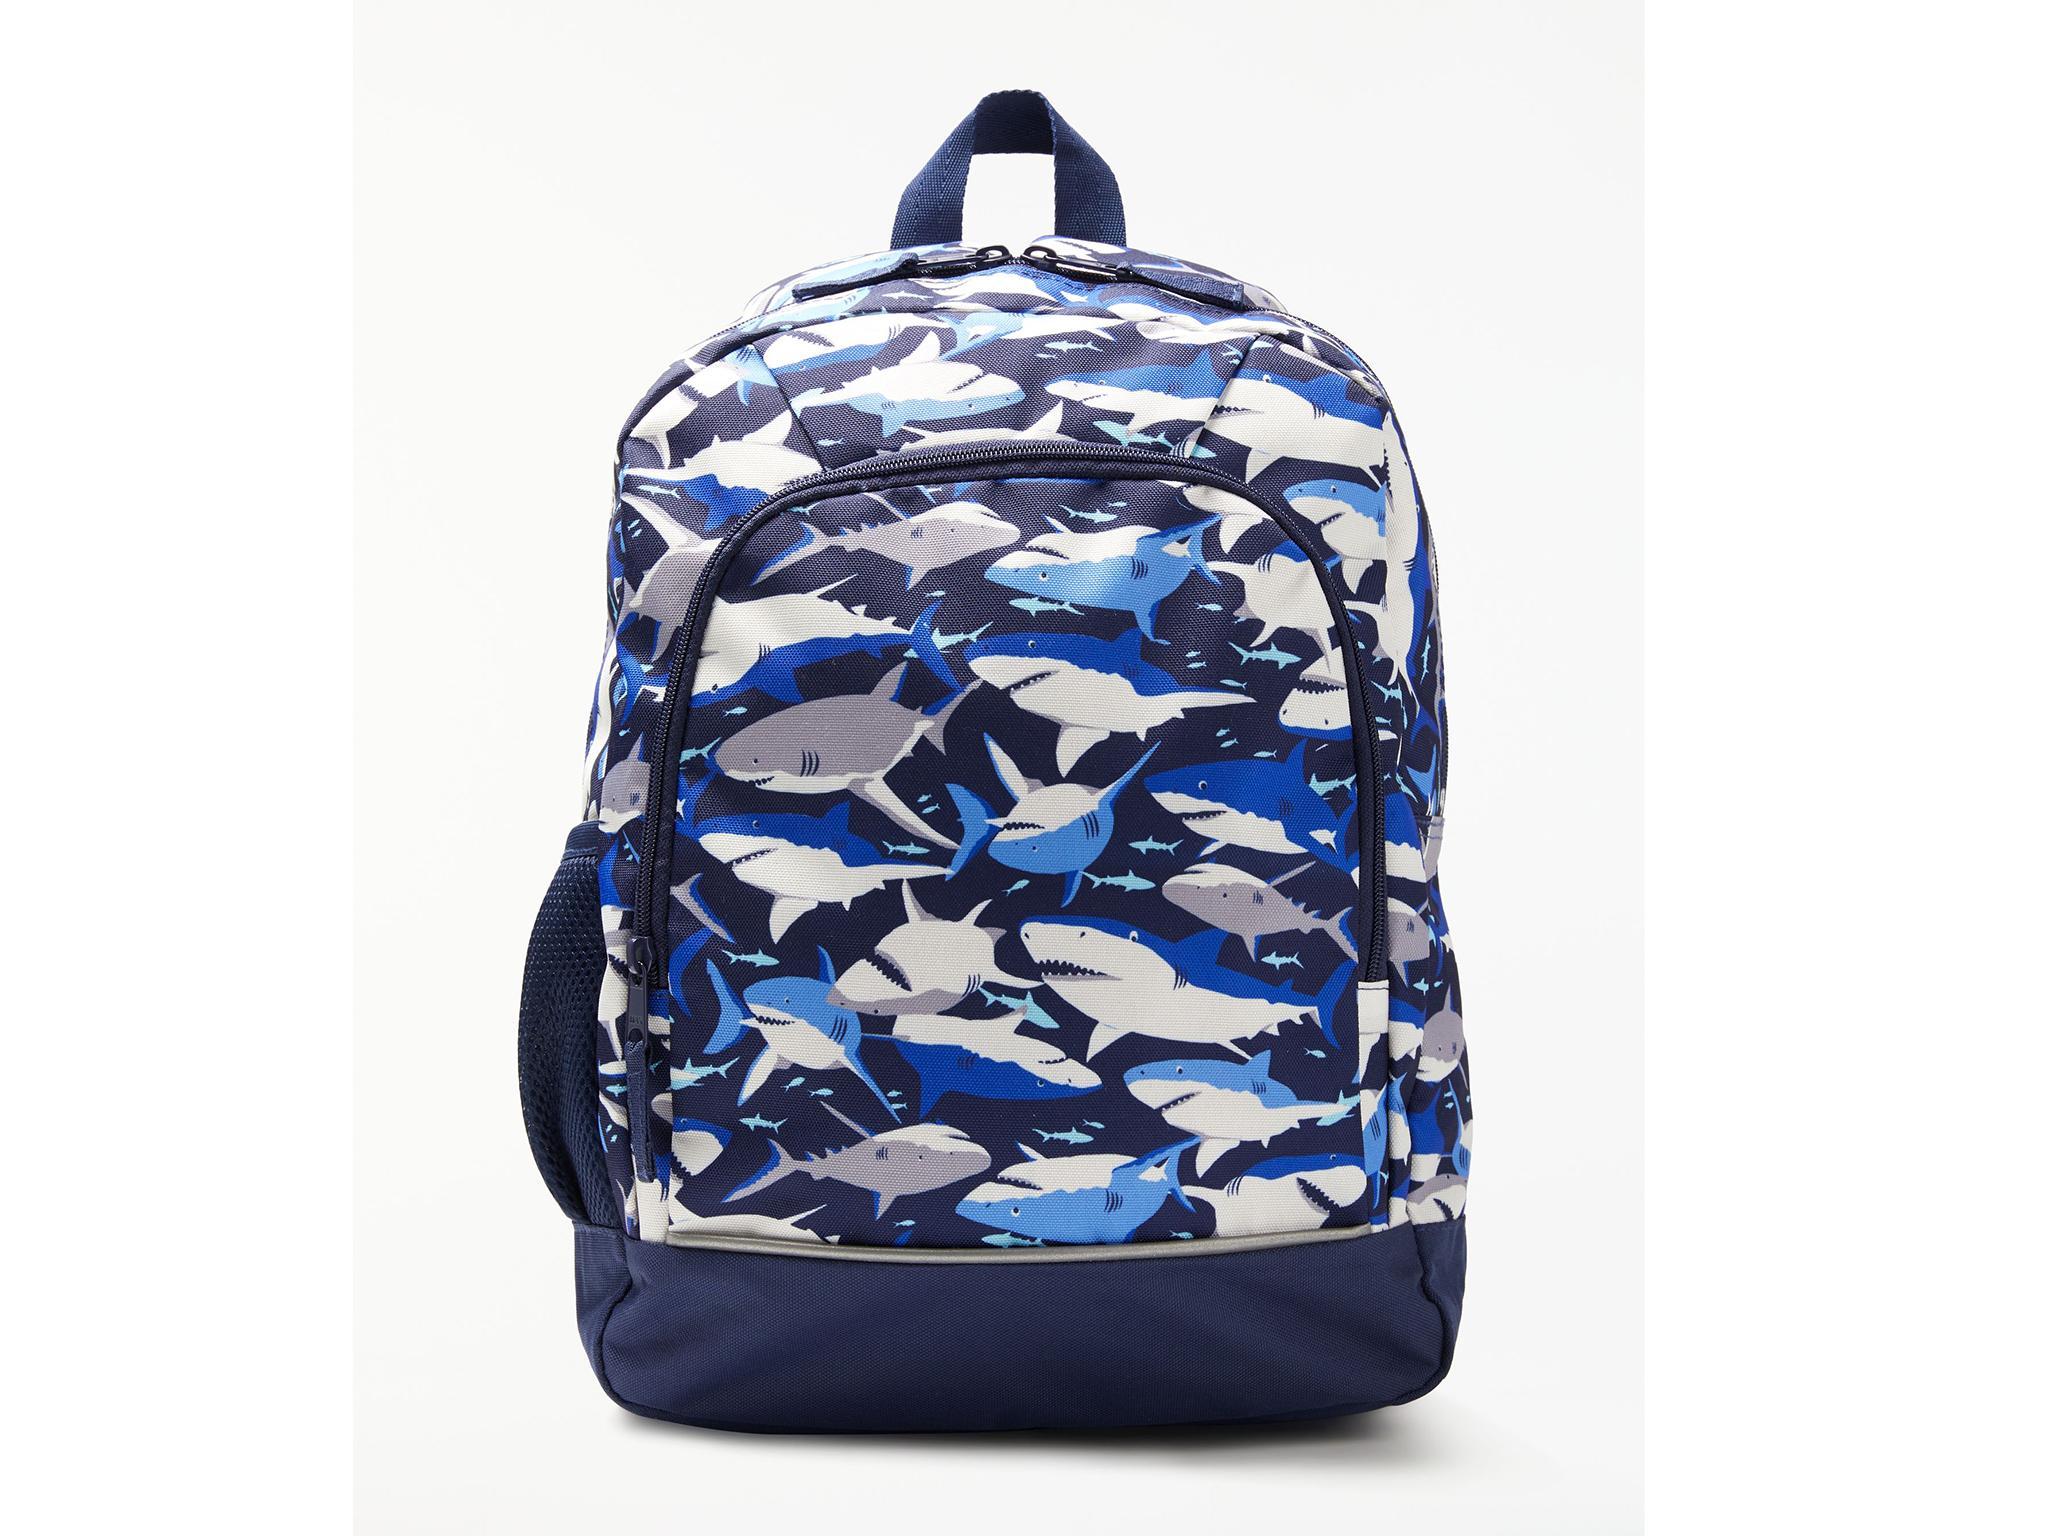 John Lewis Children s Shark Print Backpack  £20, John Lewis 90bb5a7afe